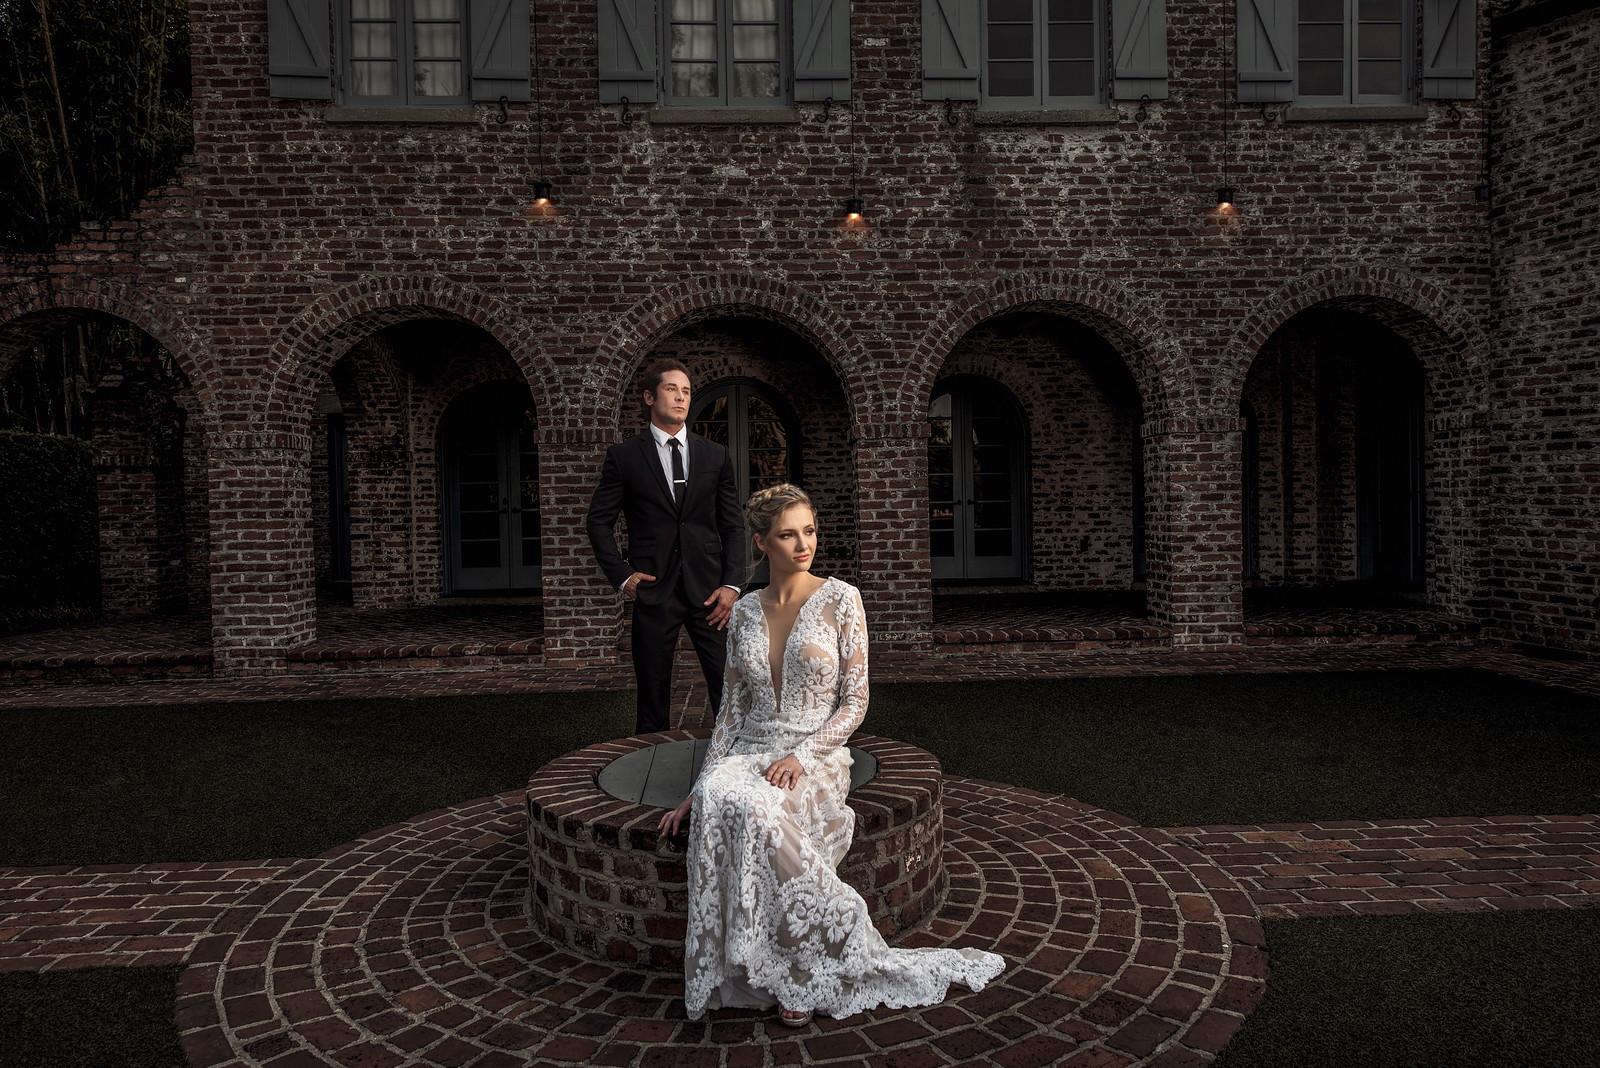 Cinematic Wedding Photography   Winter Park, FL by Yuliya Panchenko